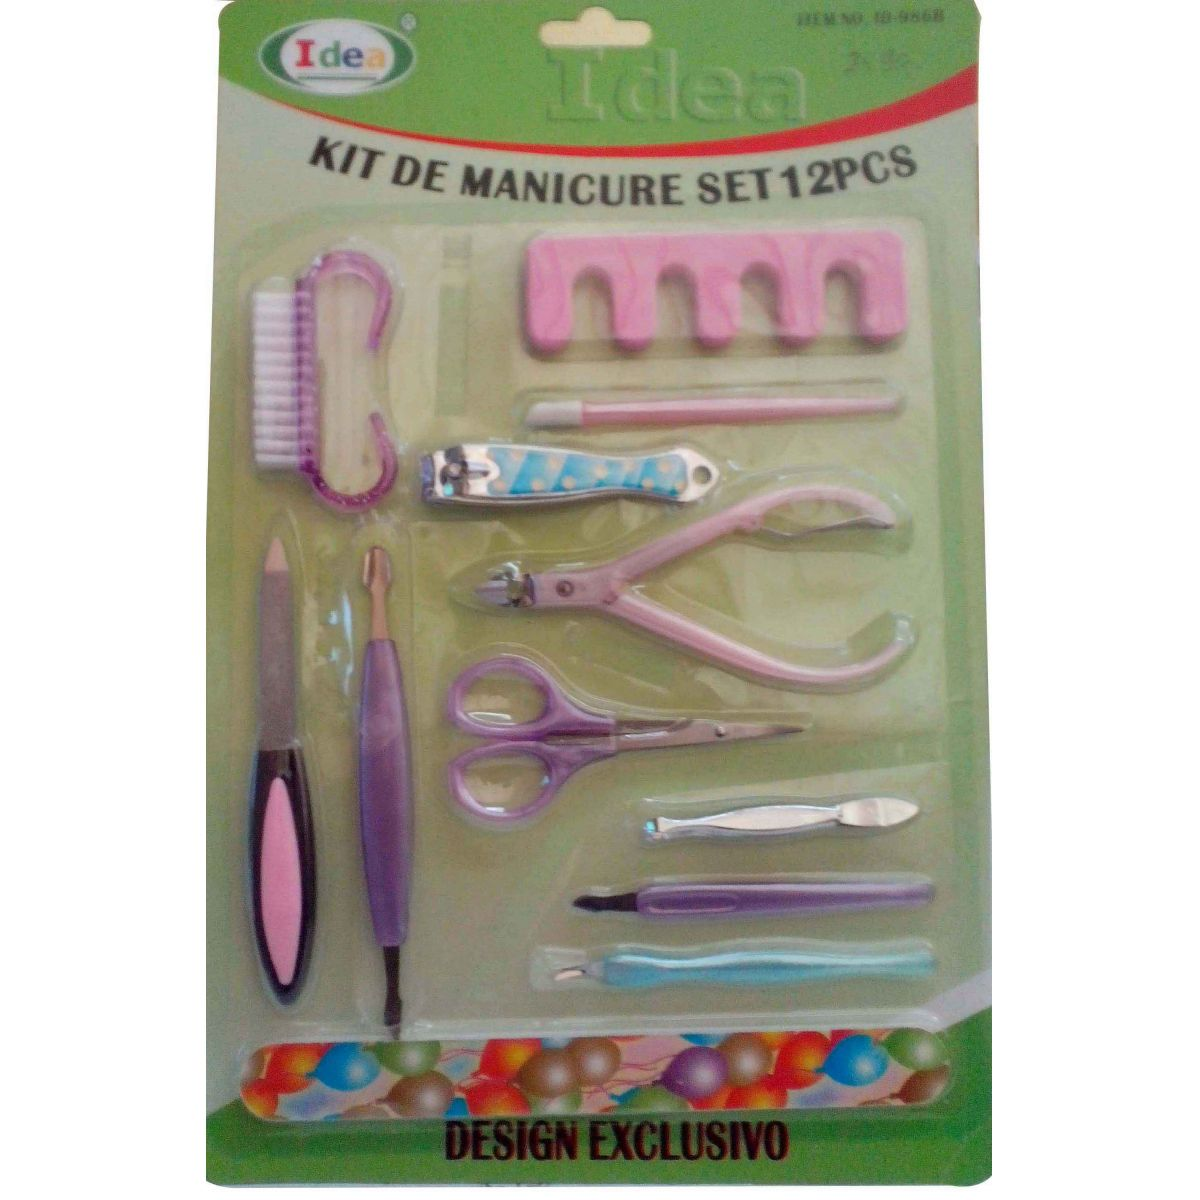 Kit Manicure Set 12 Peças - Frete Grátis  - Thata Esportes